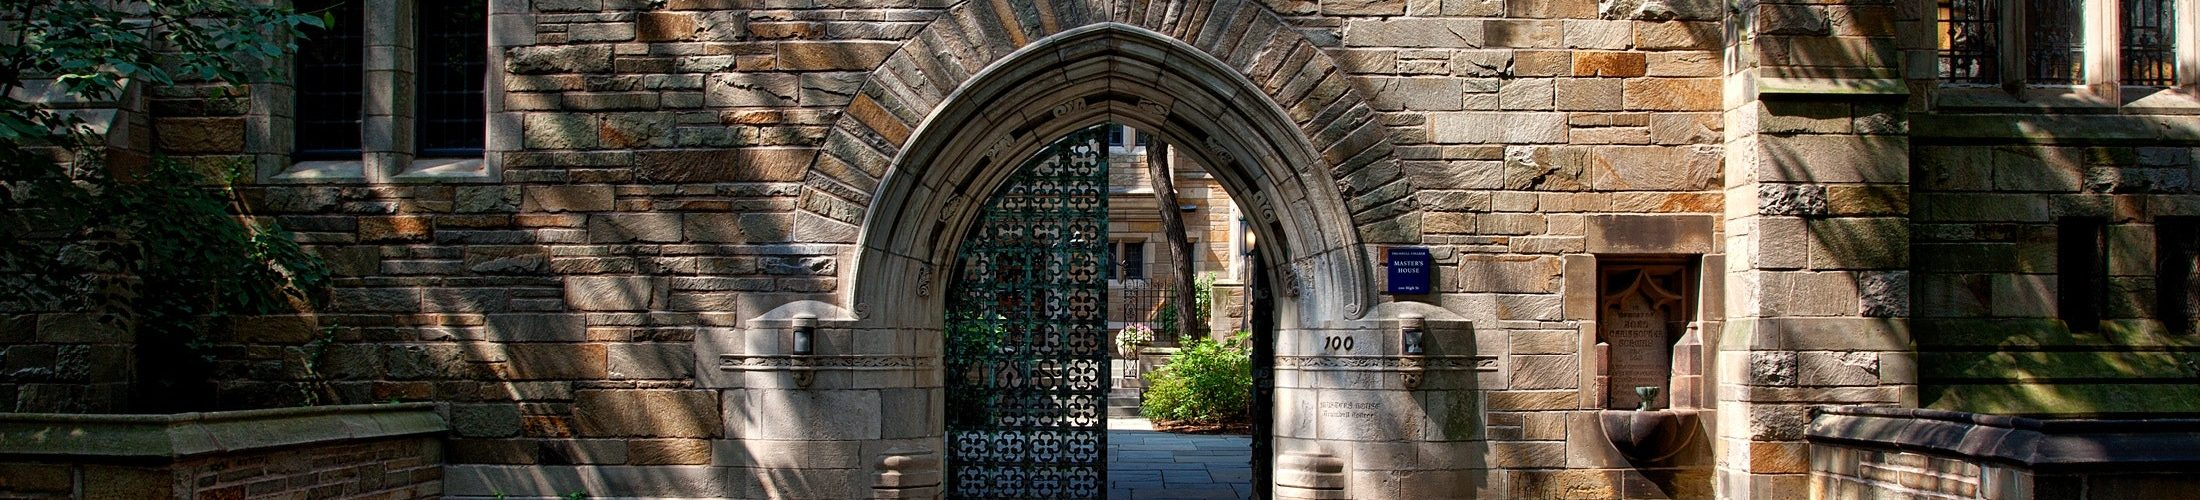 Gates into a college campus